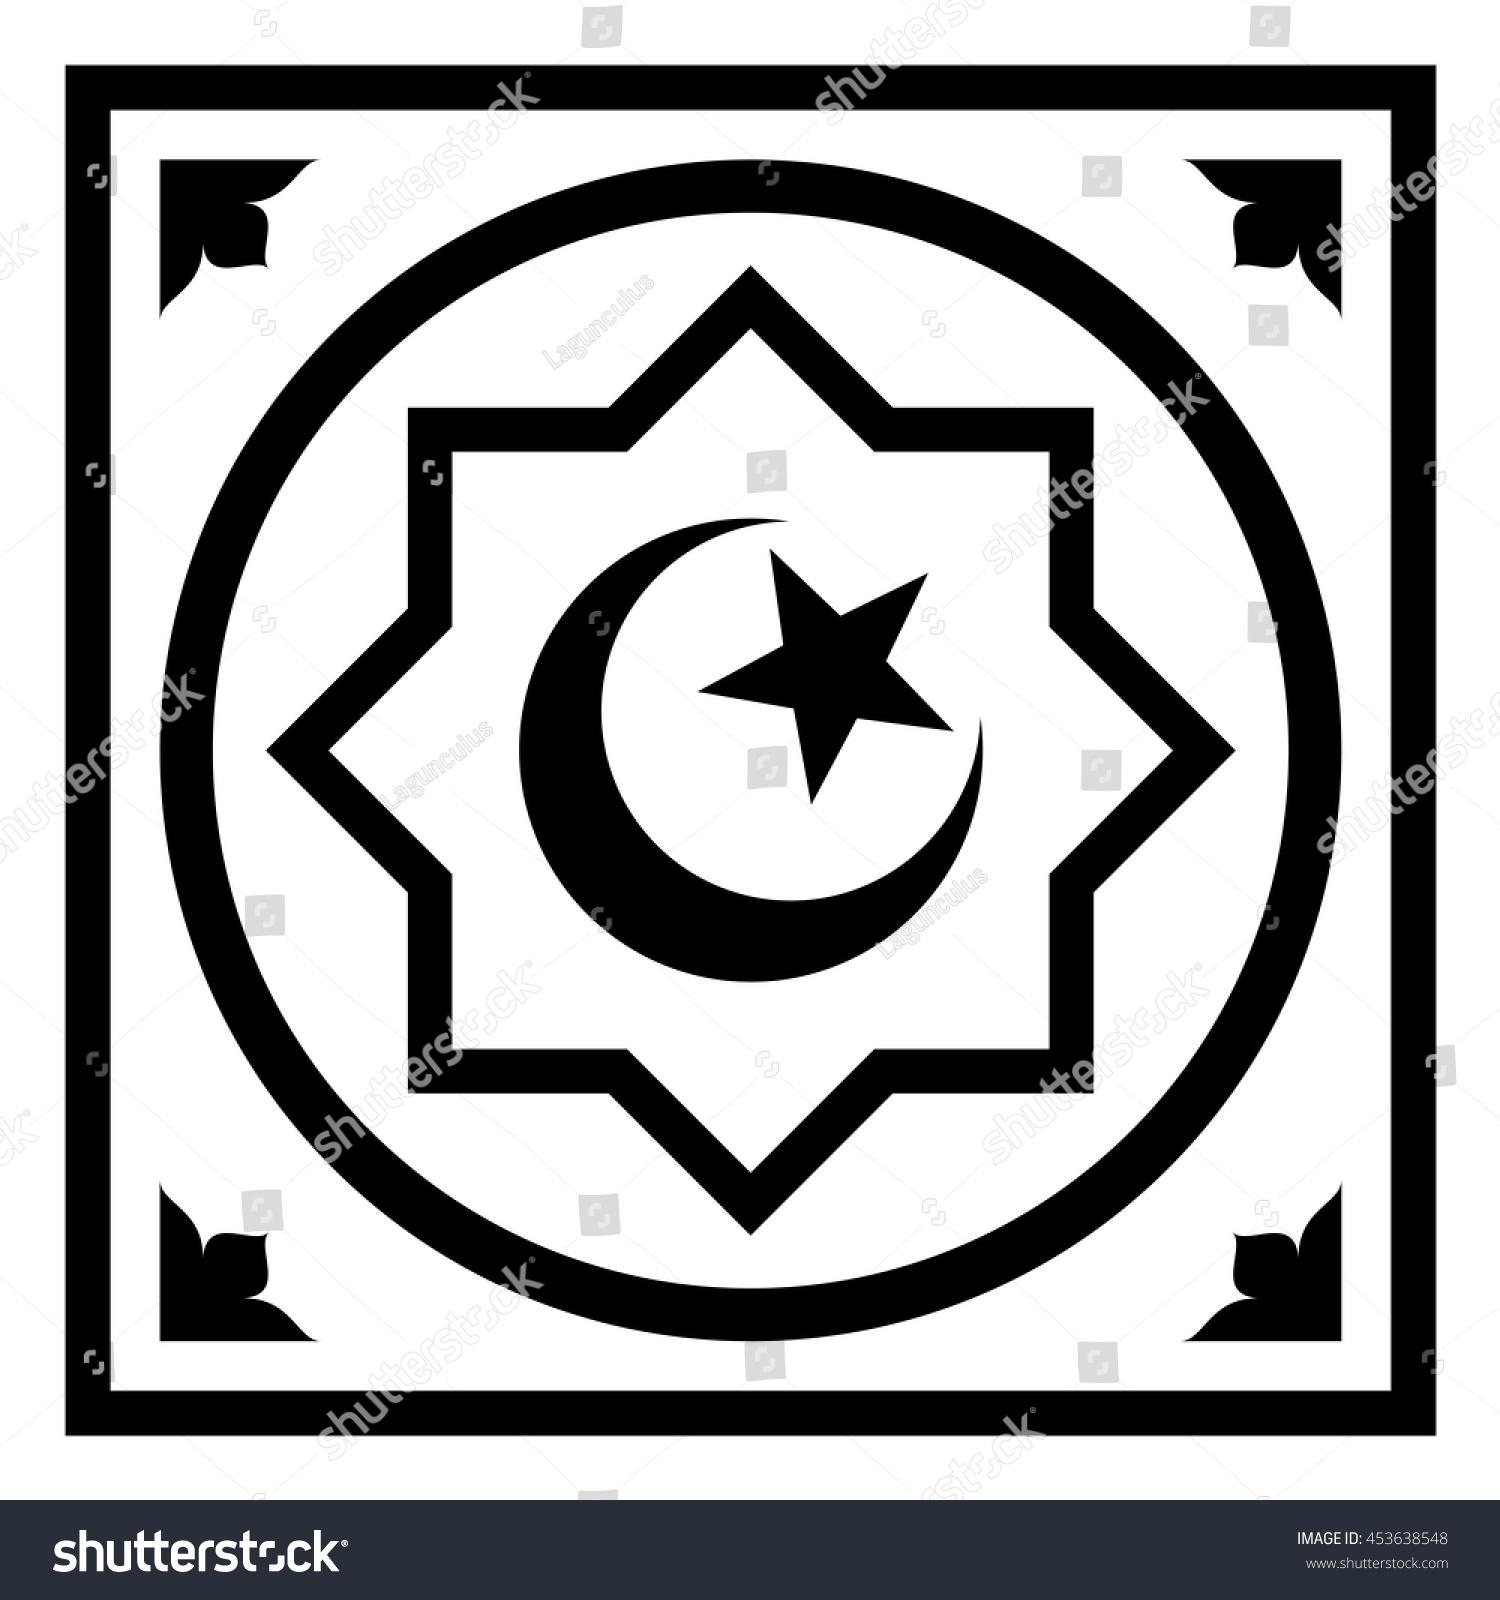 Symbol islam star crescent octagon flat stock vector 453638548 symbol of islam star and crescent in the octagon flat icon isolated vector illustration biocorpaavc Images